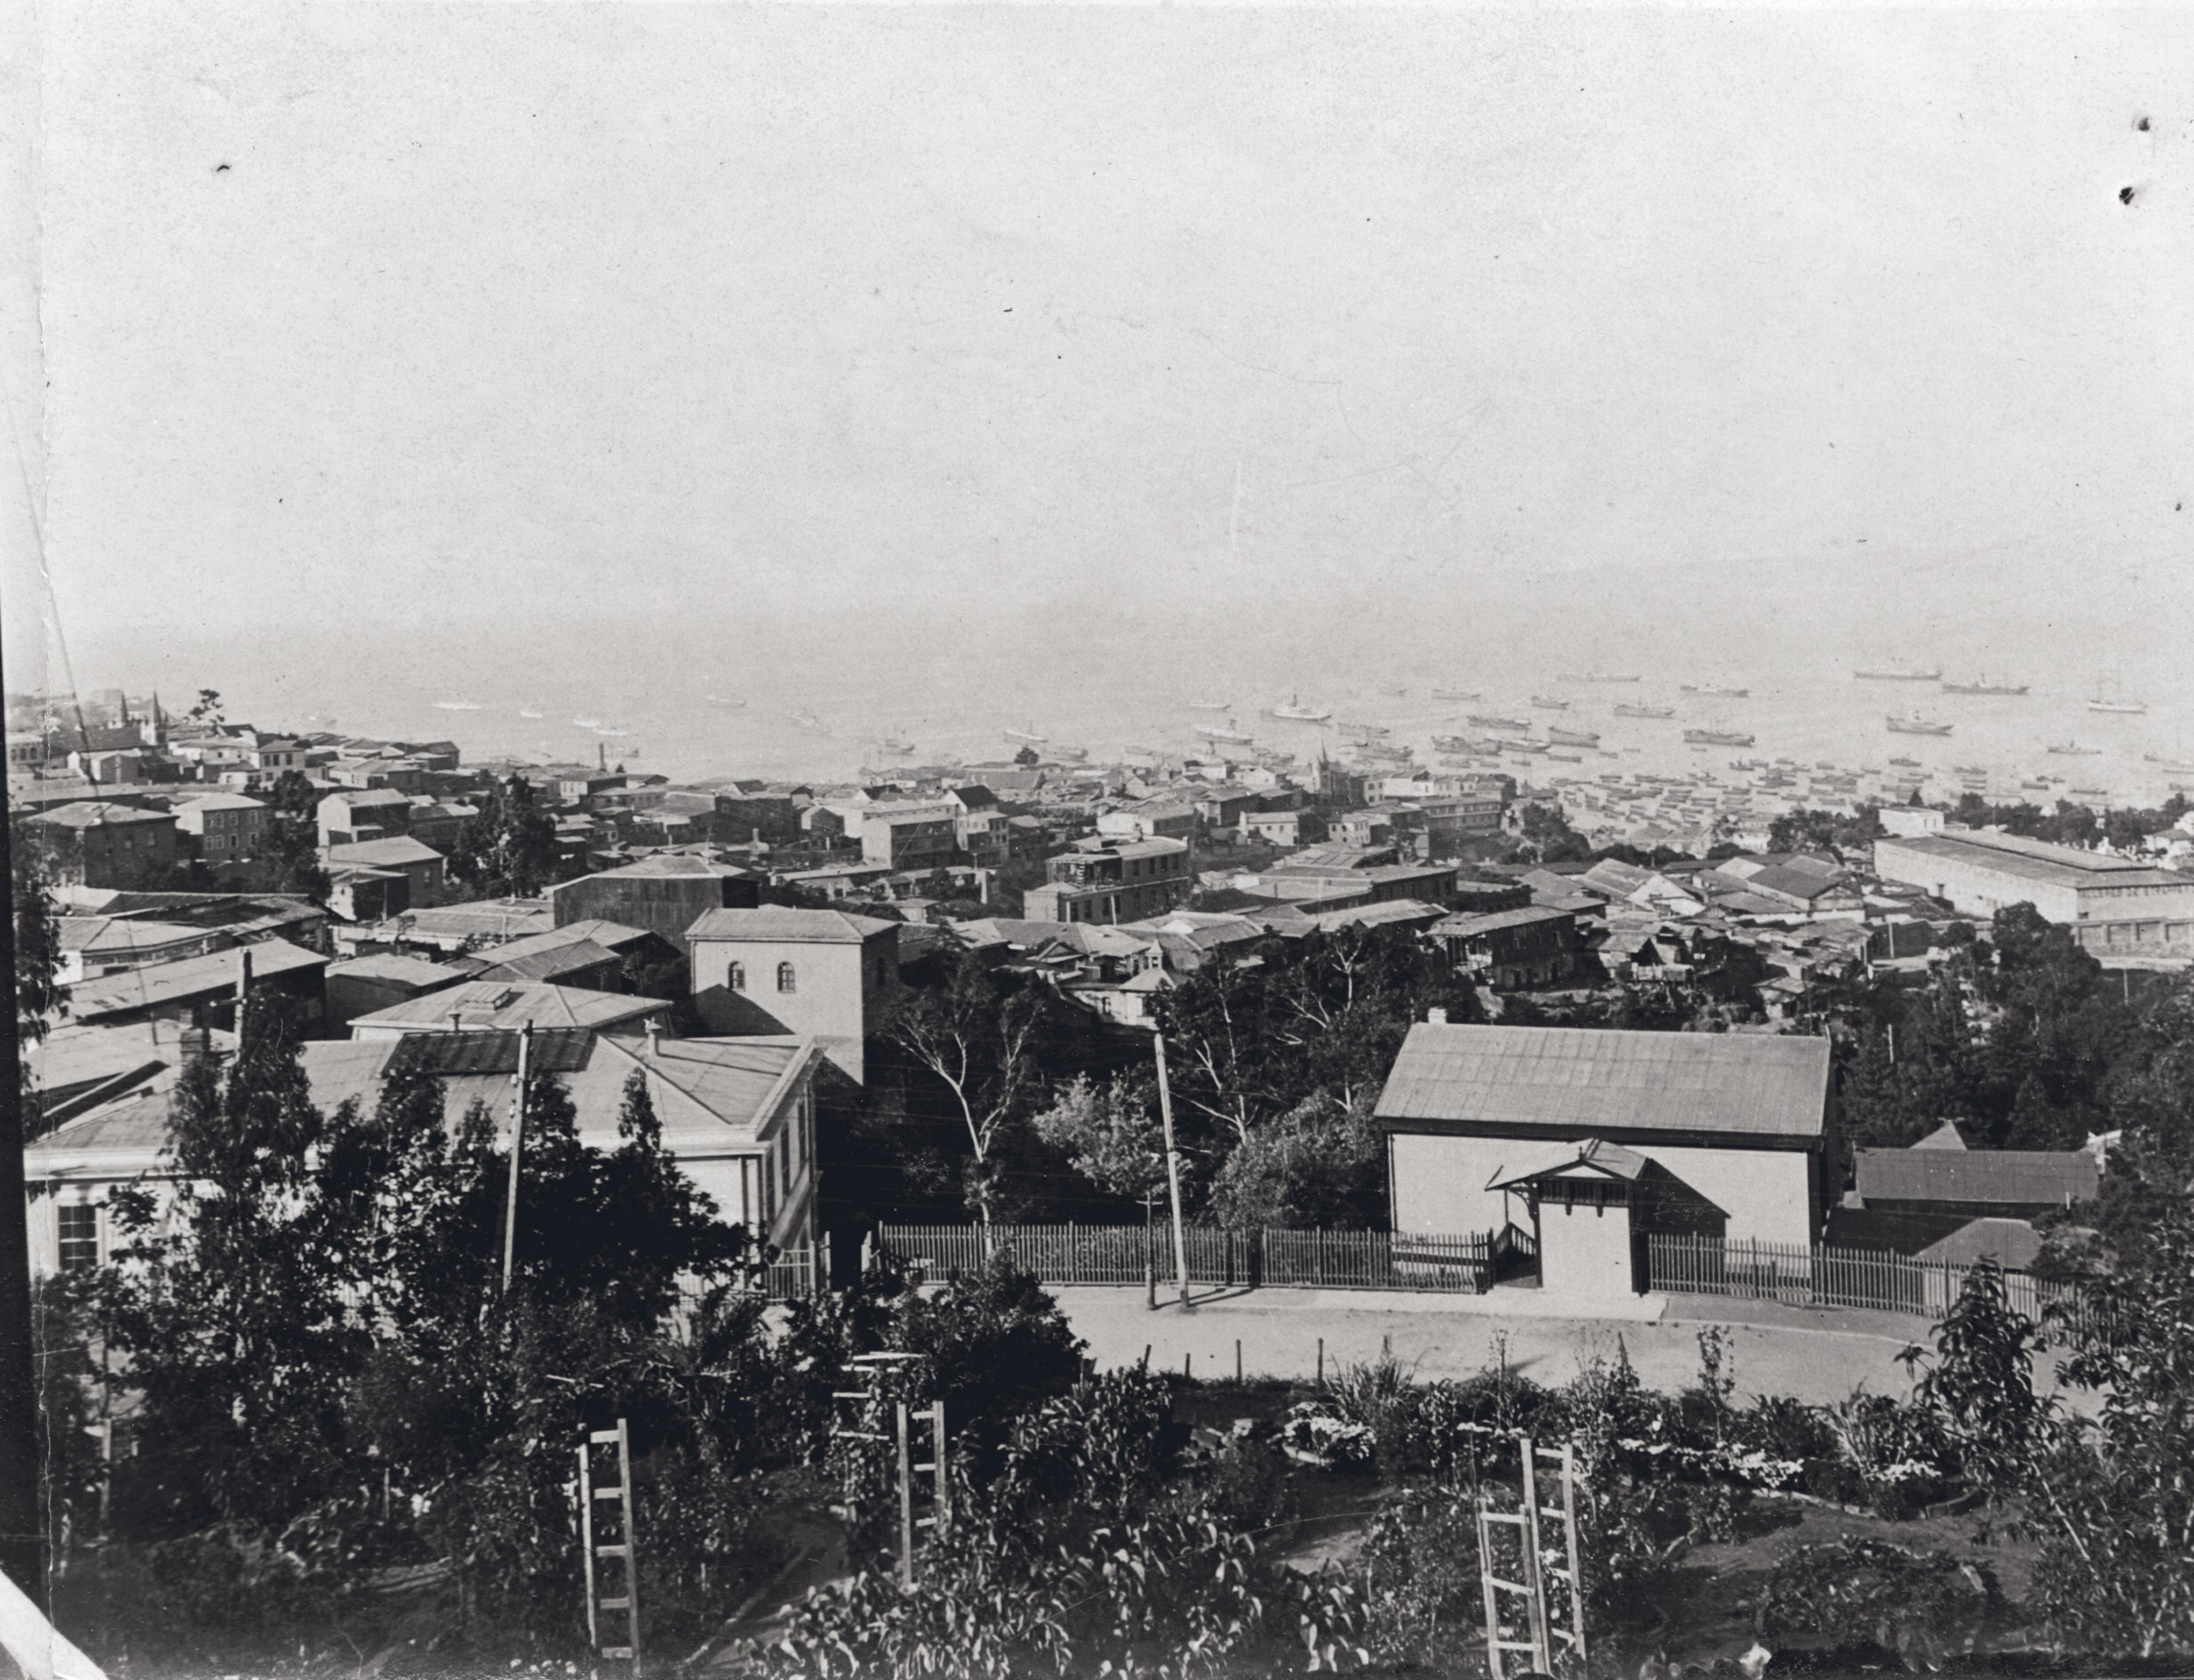 Enterreno - Fotos históricas de chile - fotos antiguas de Chile - Vista de Valparaíso, 1920s